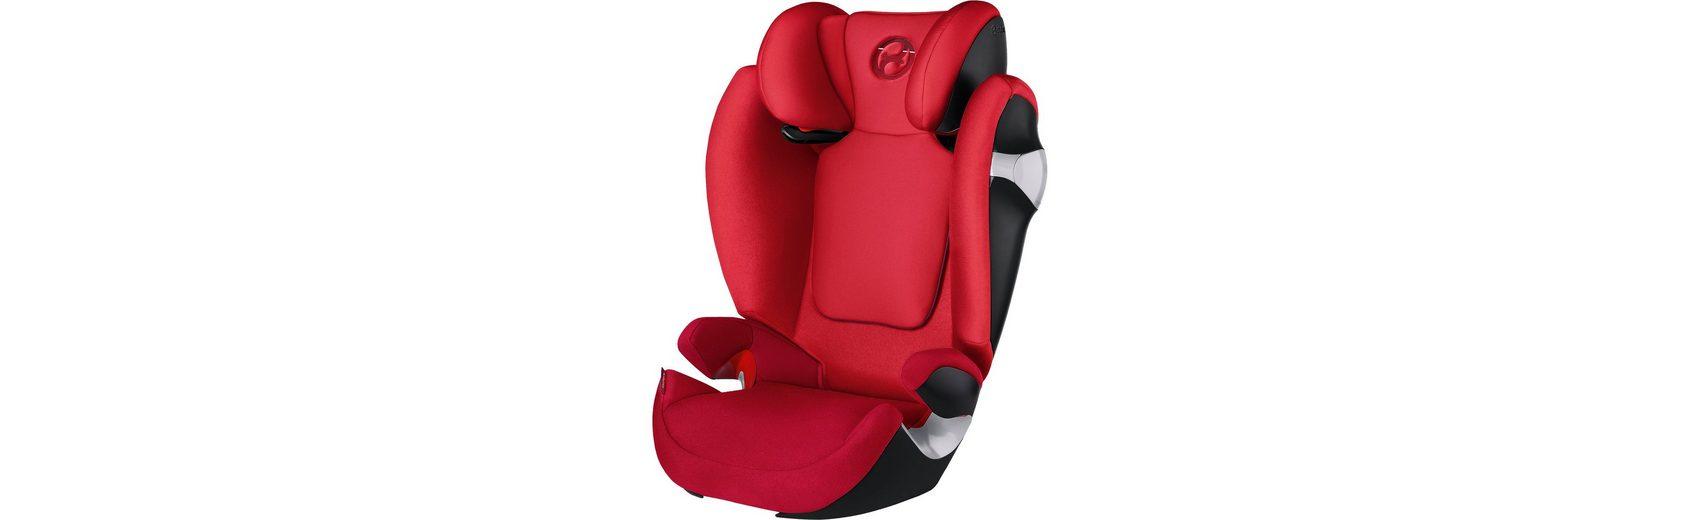 Cybex Auto-Kindersitz Solution M, Gold-Line, Infra Red-Red, 2017